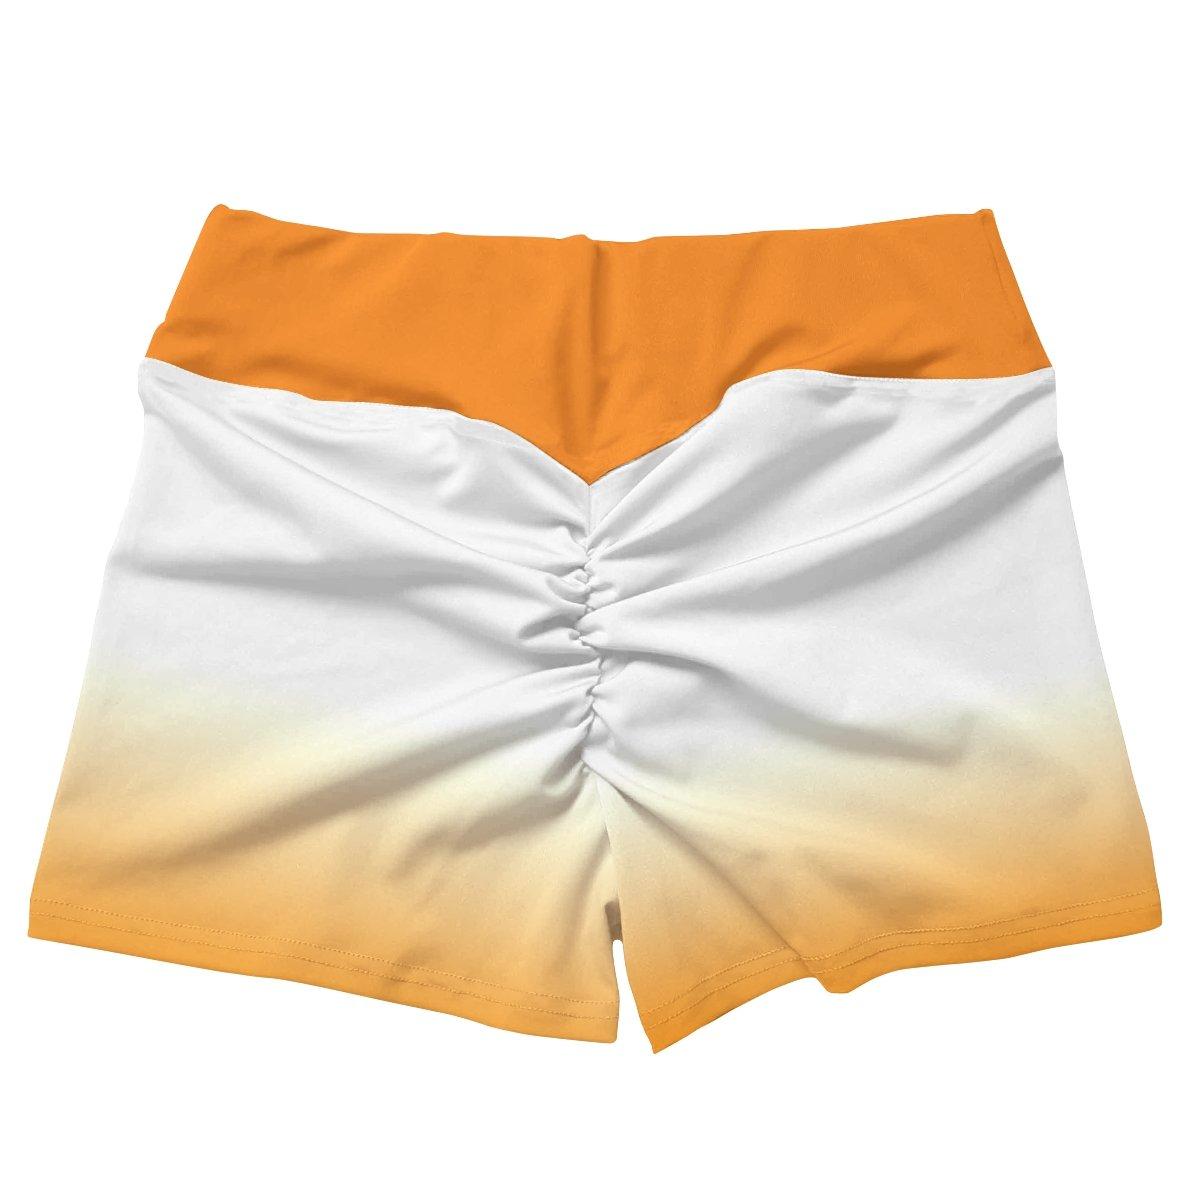 schweiden adlers active wear set 475951 - Anime Swimsuits